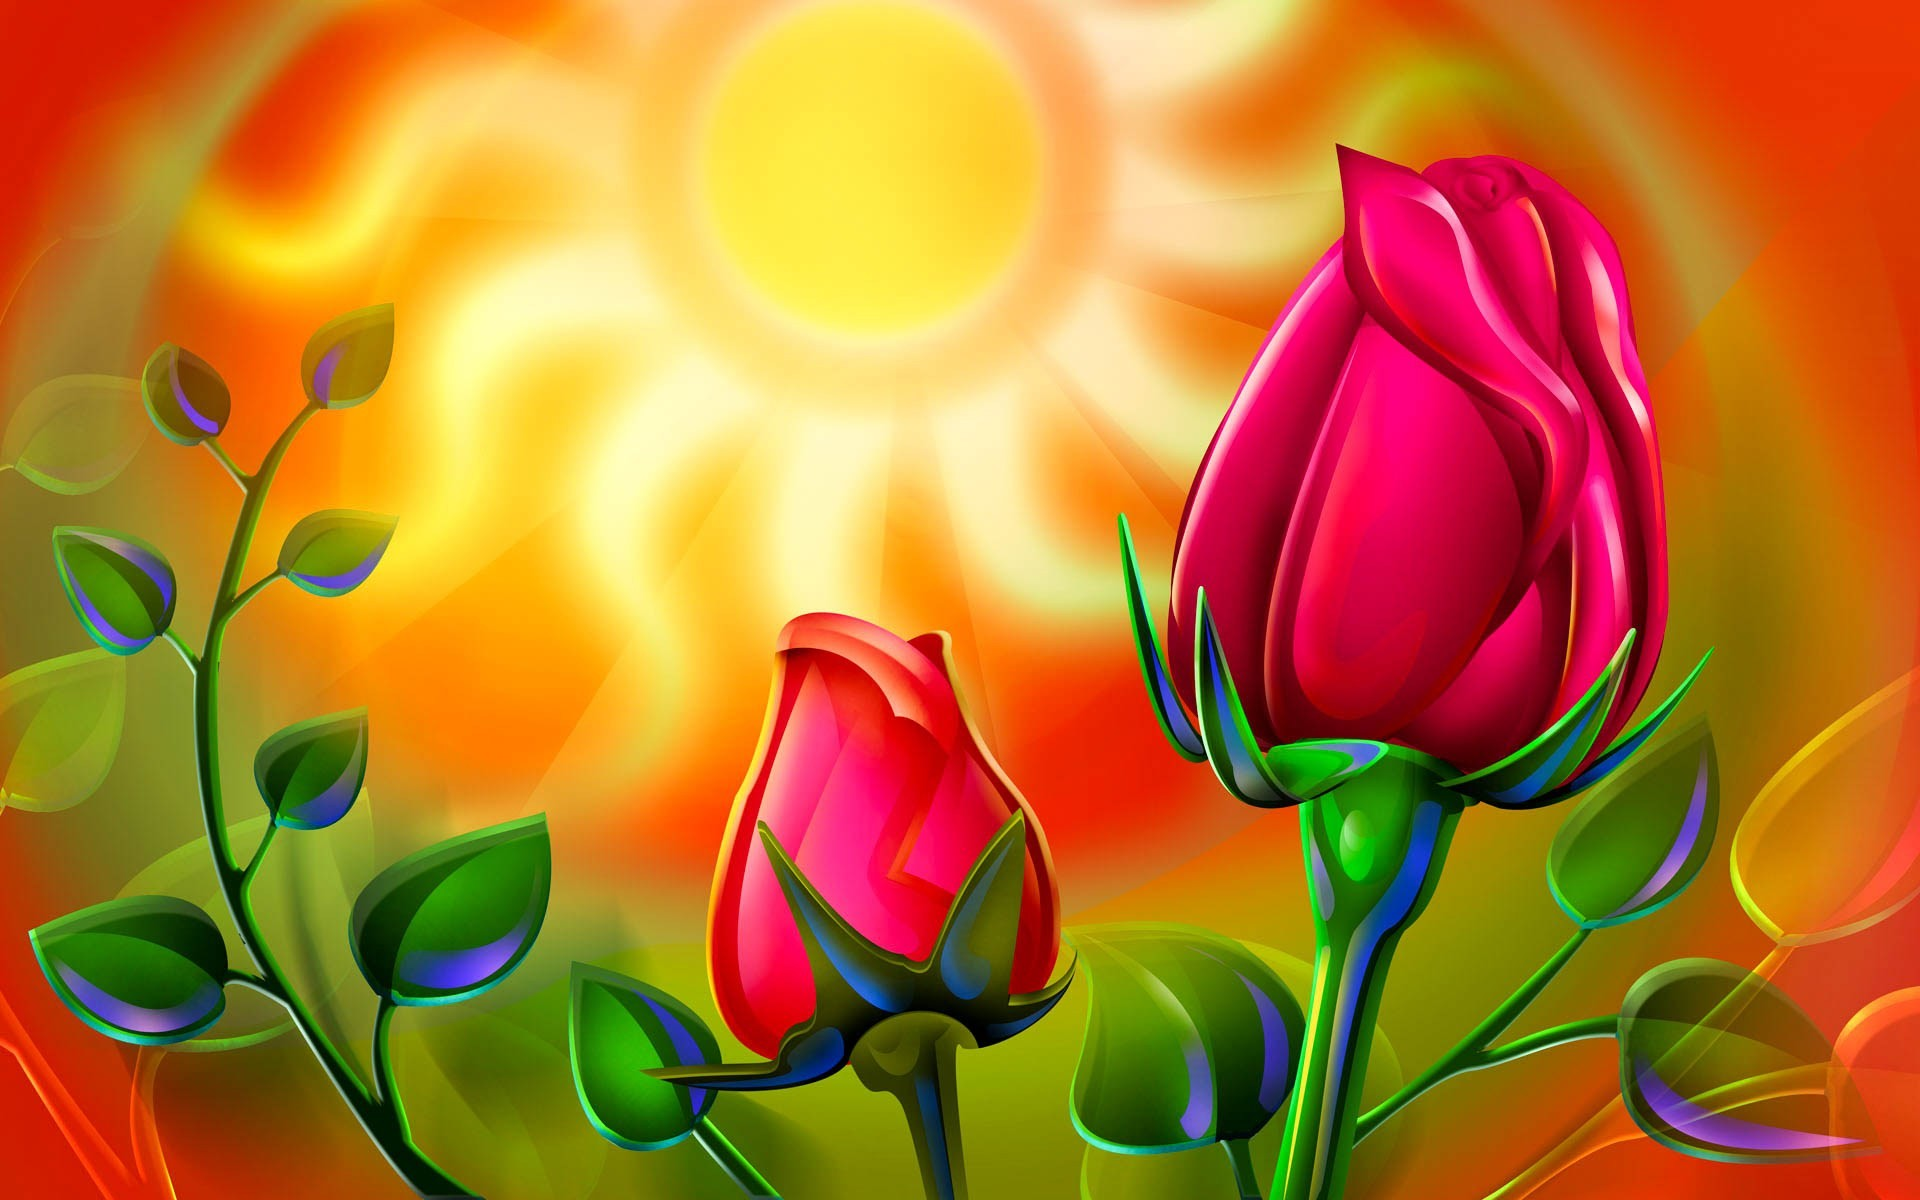 Most Beautiful Flower HD Wallpaper. rose hd wallpaper